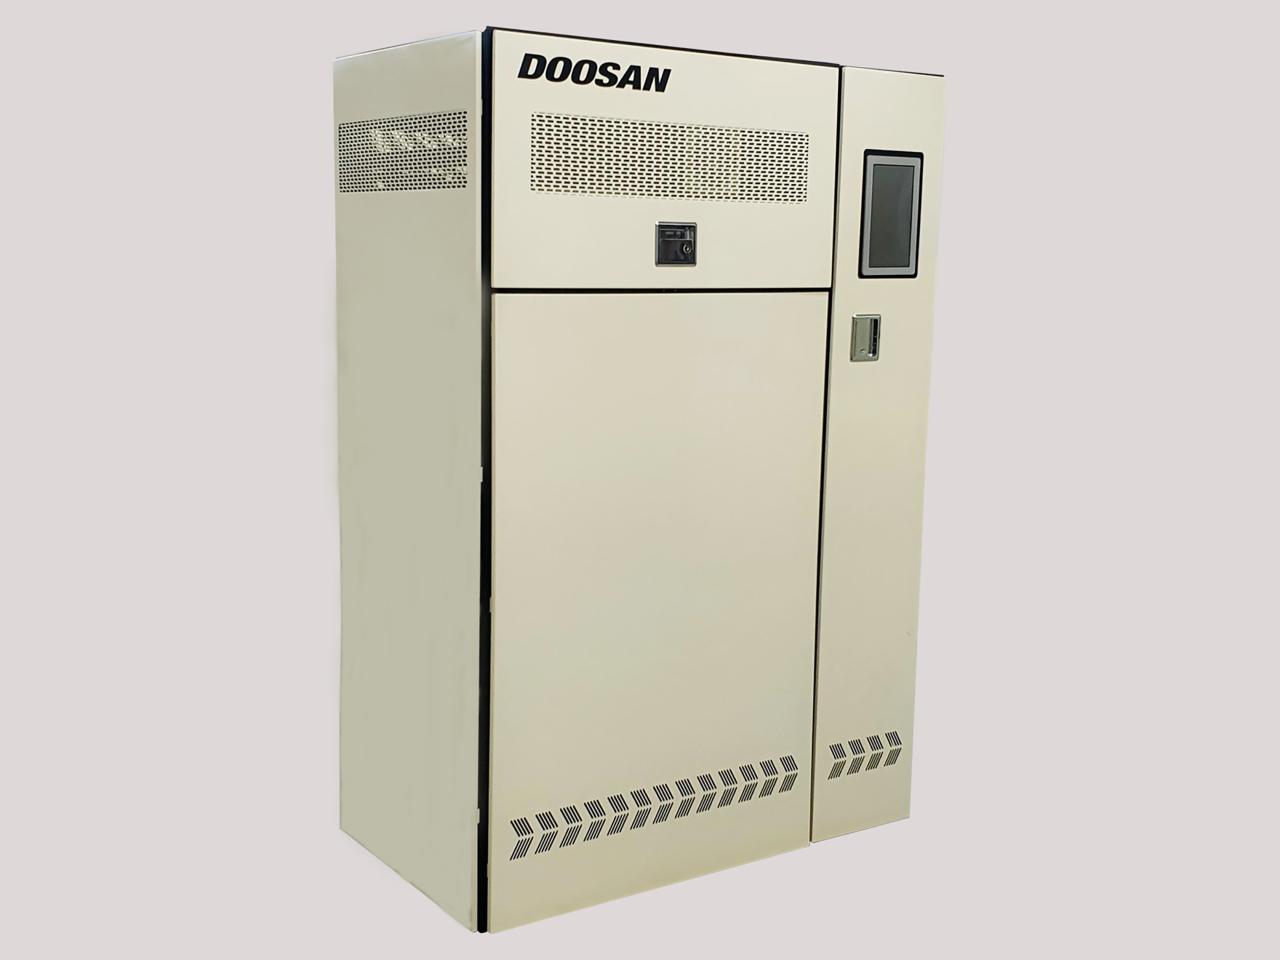 Doosan Corp.'s 10-kilowatt solid oxide fuel cell for homes and buildings (Doosan Corp.)